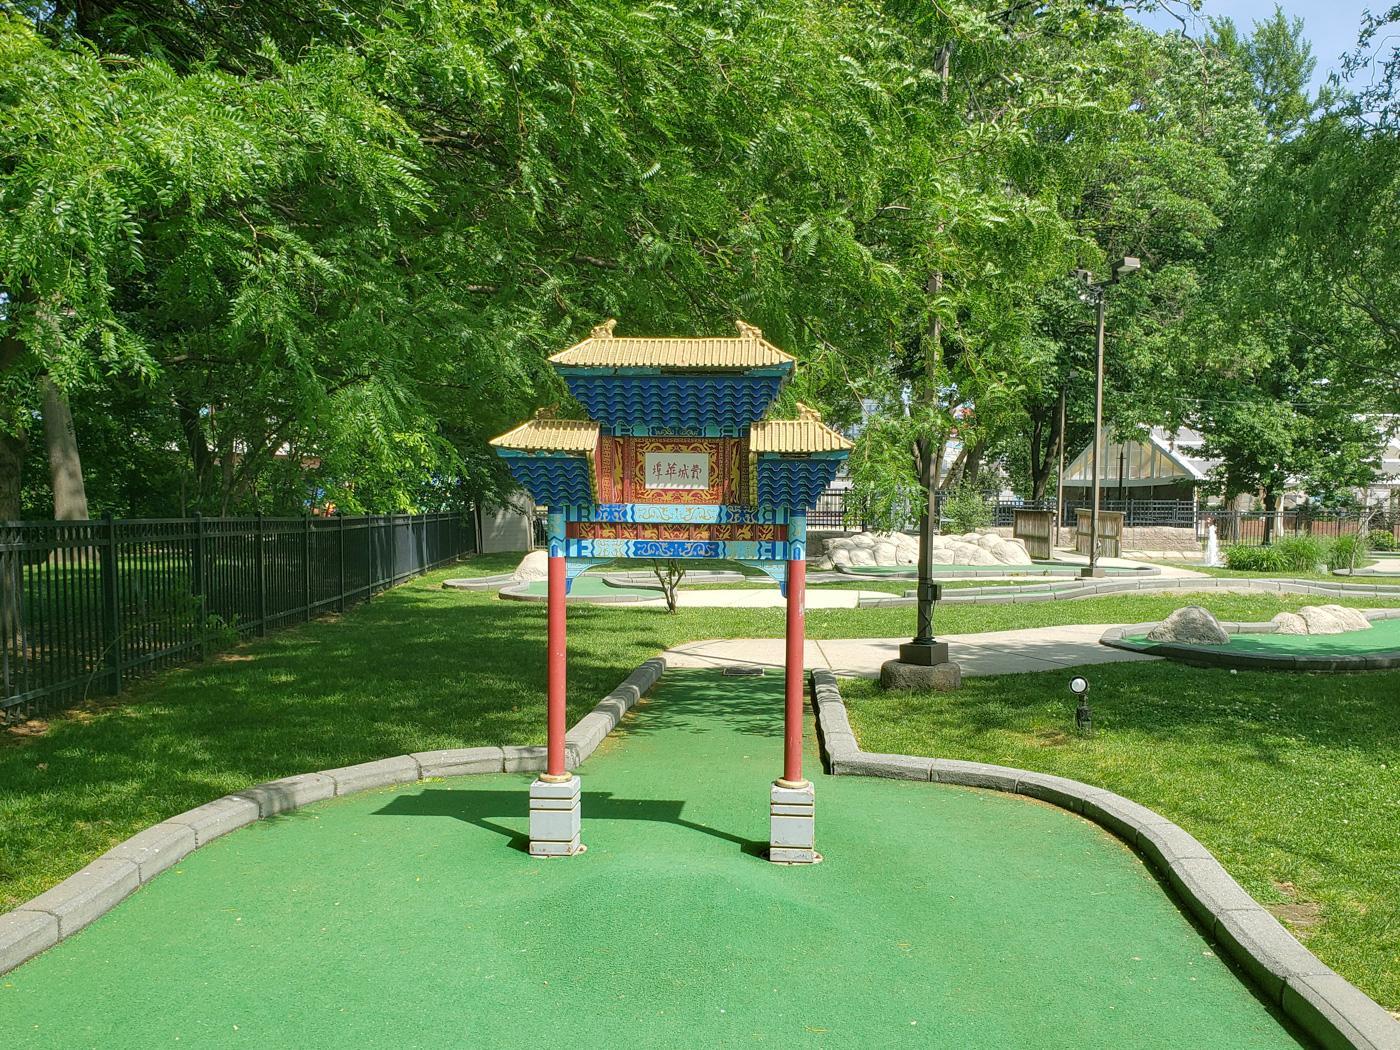 Friendship Gate at Franklin Square Mini-Golf